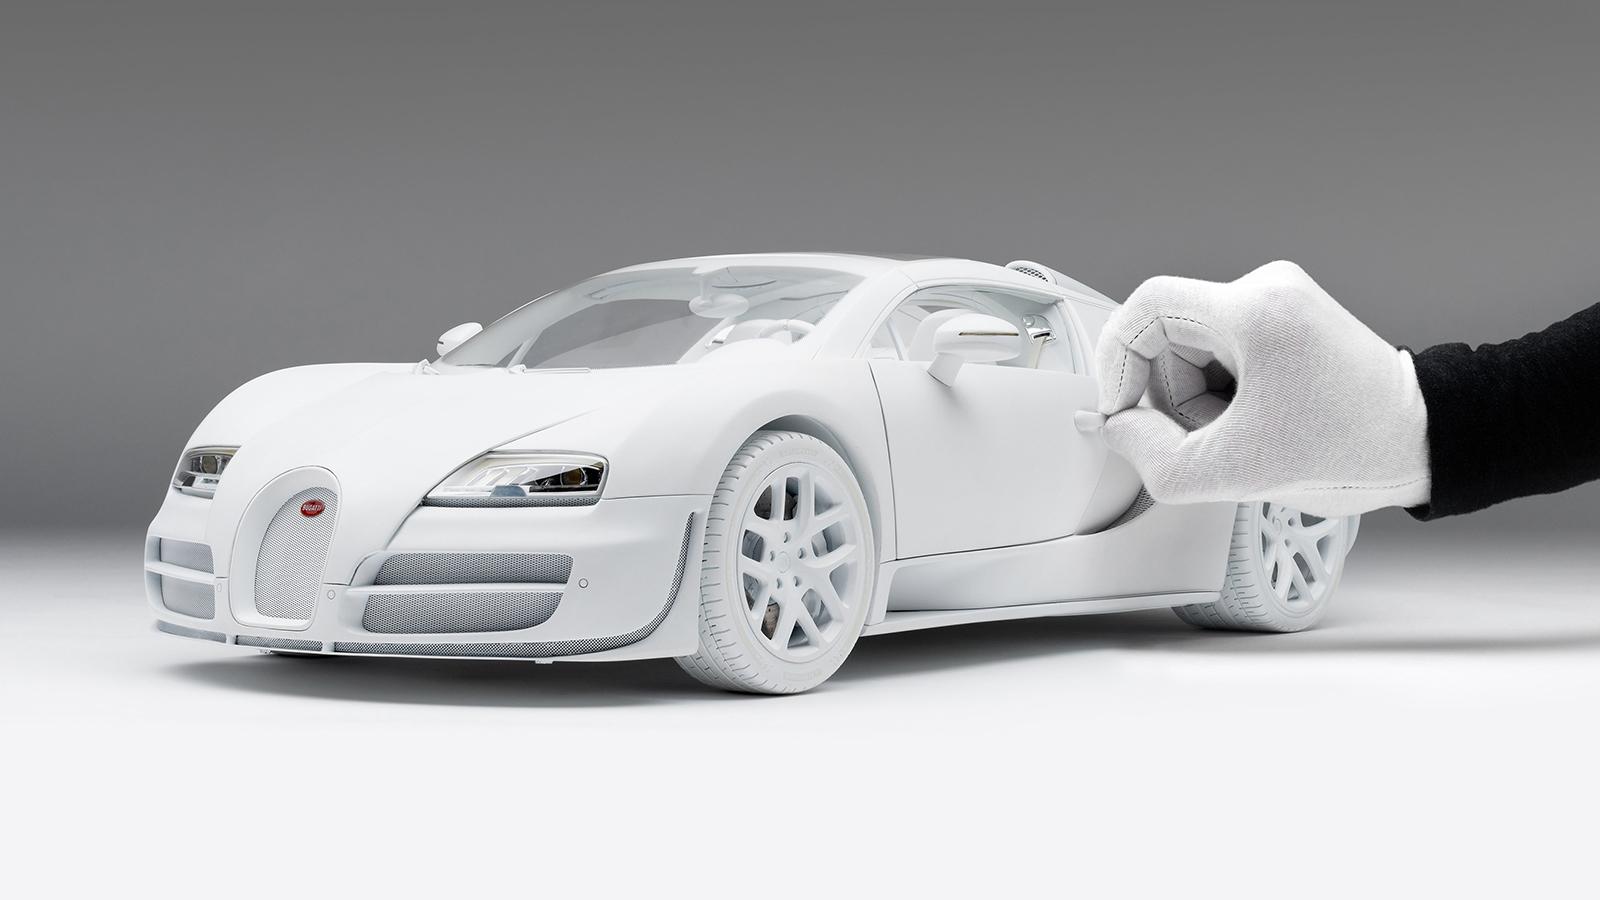 Bugatti Veyron 16.4 Grand Sport Vitesse White Edition 1:8 scale